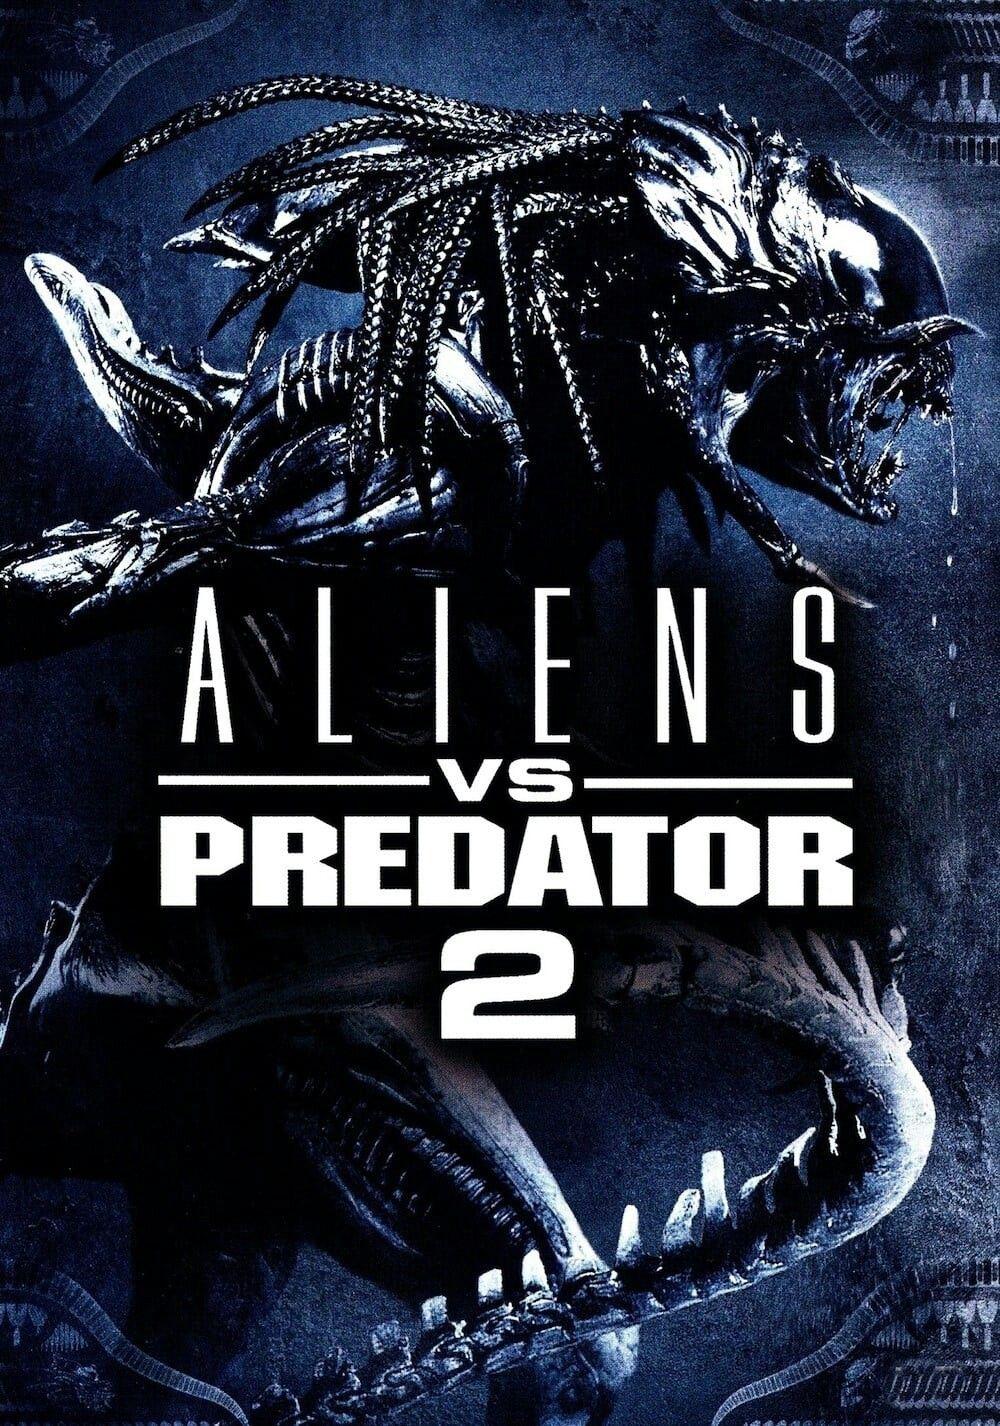 Alien vs predator requiem movie poster fantastic movie posters scifi movie posters horror movie posters action movie posters drama movie posters